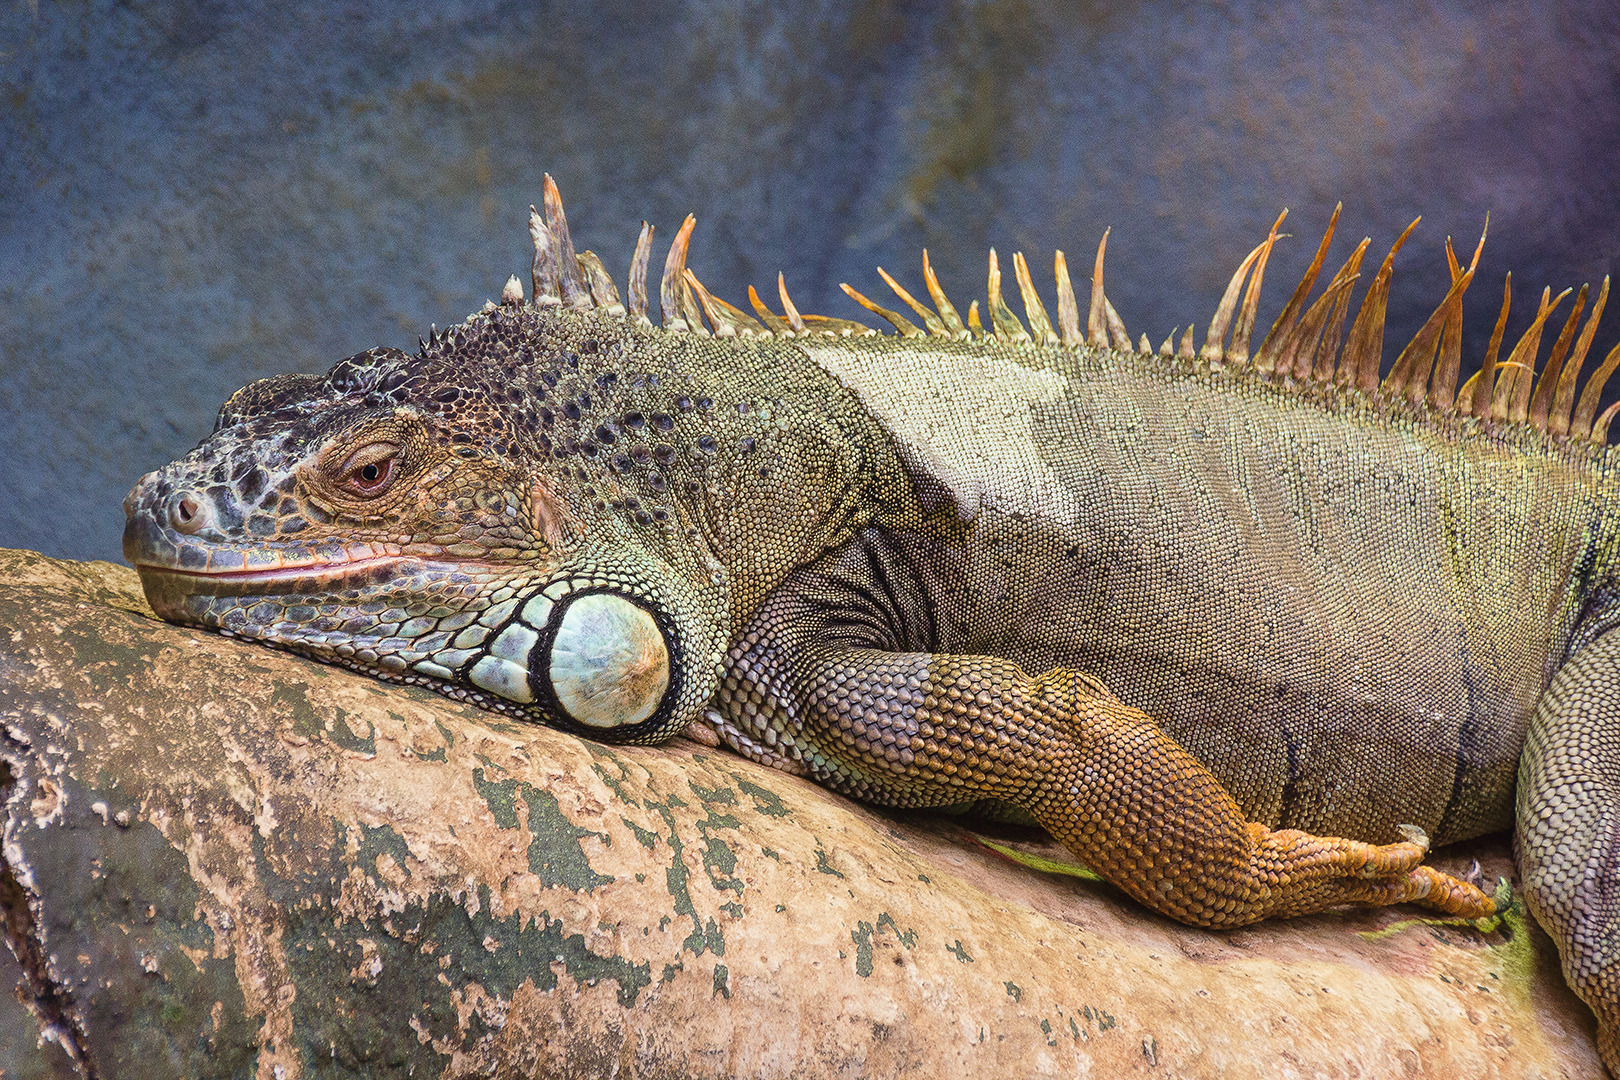 George The Iguana. David Bishop